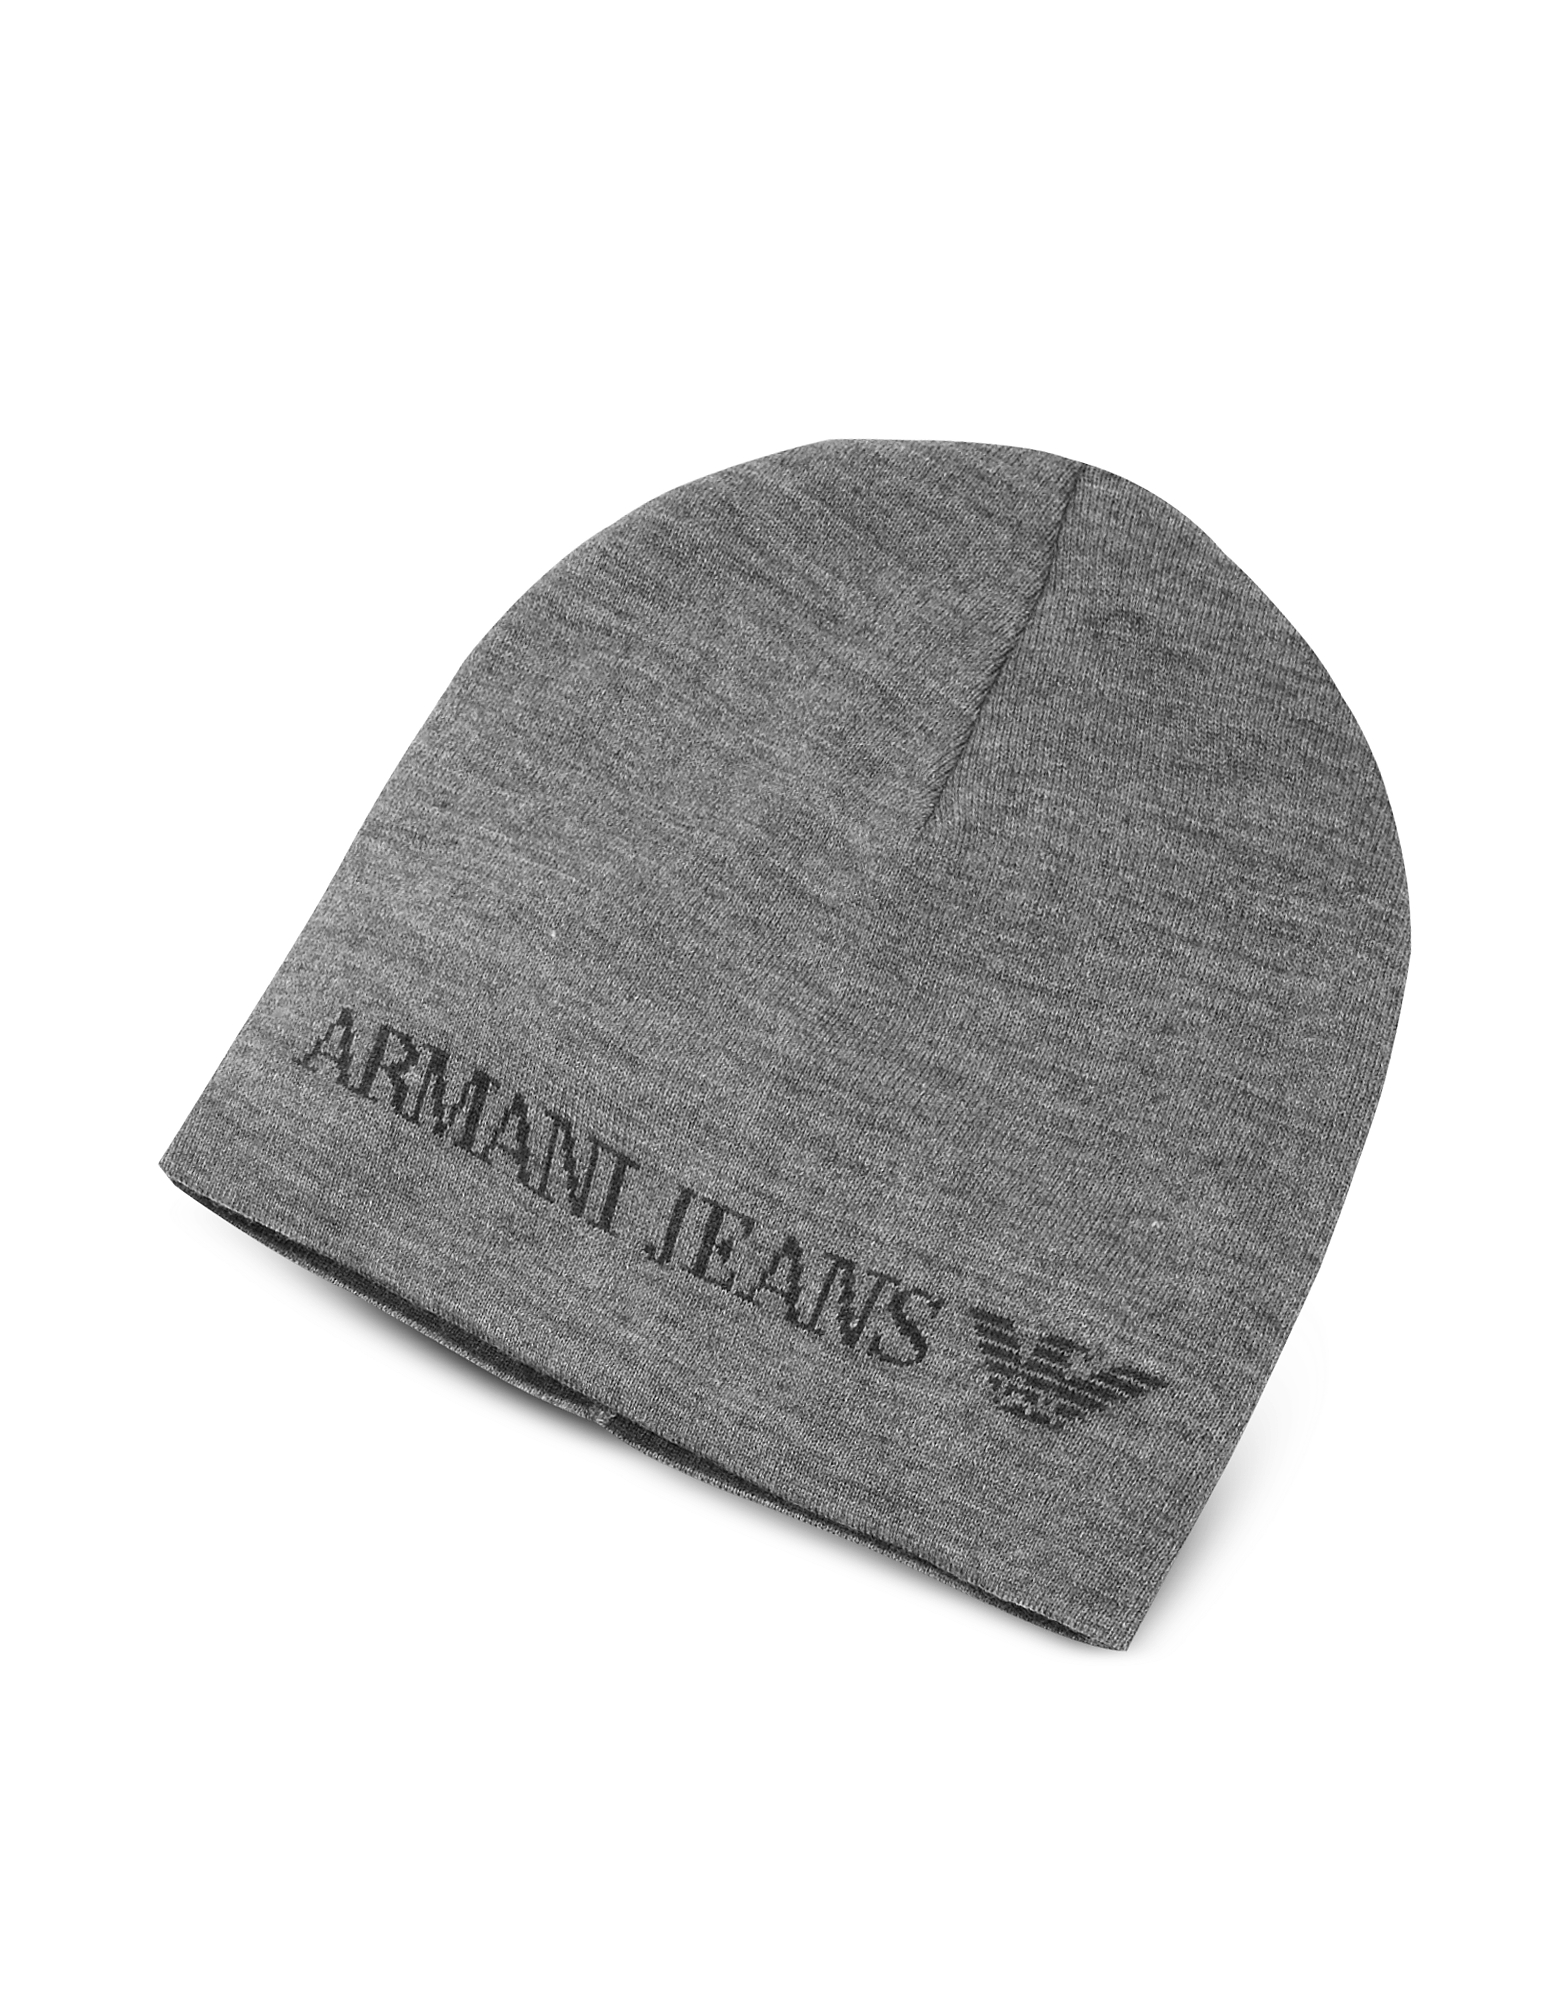 Armani Jeans Designer Men's Hats, Solid Wool Blend Men's Beanie Hat